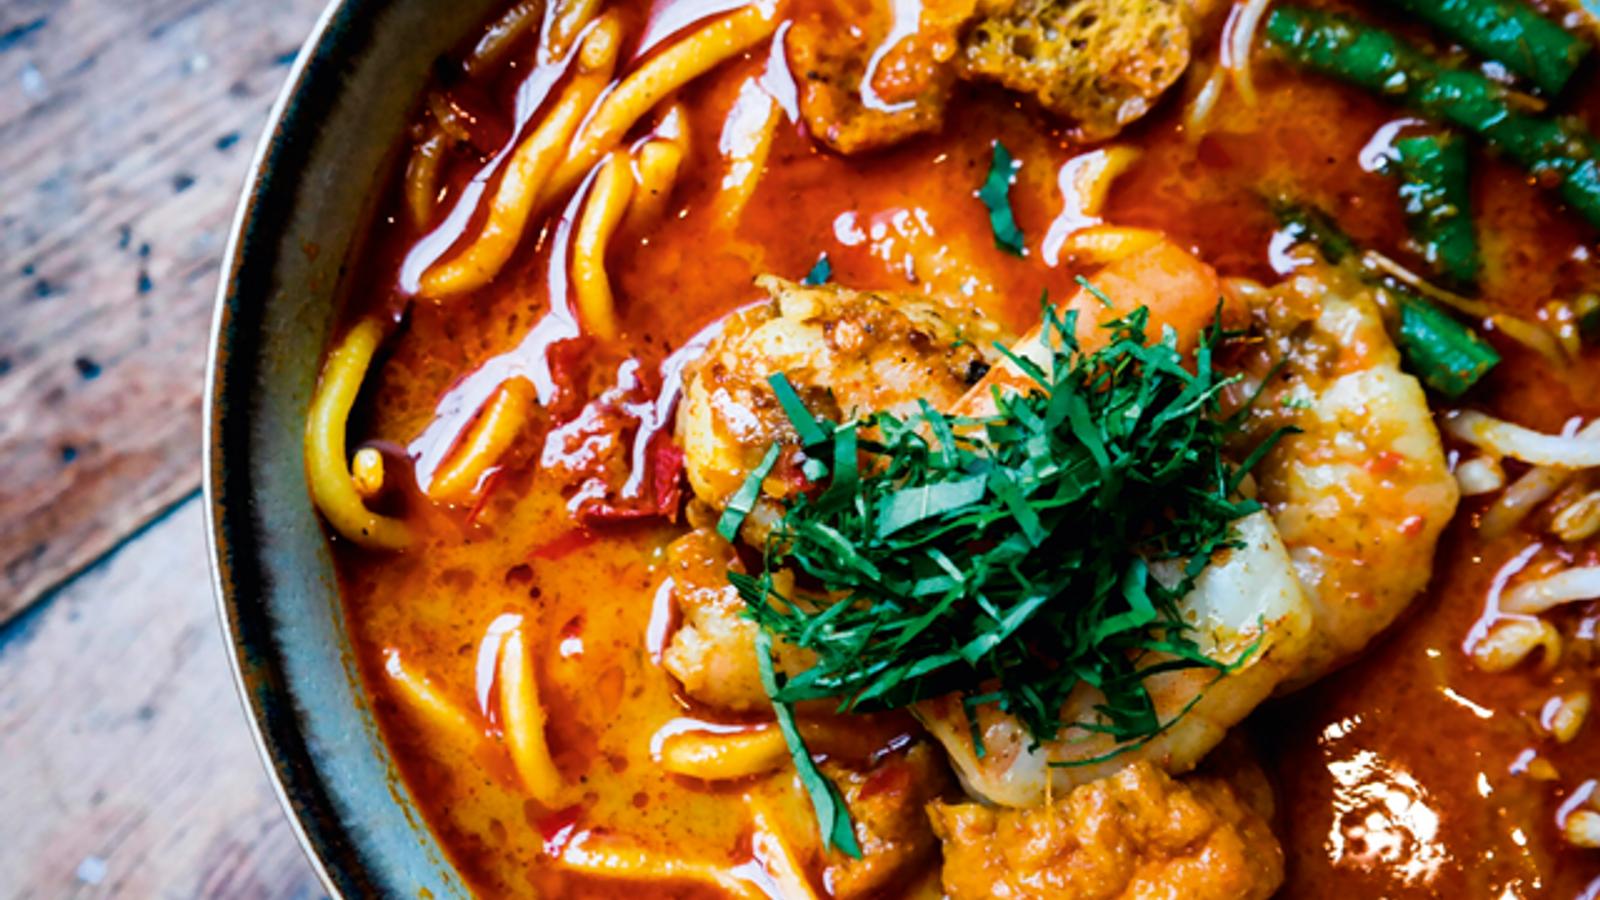 A bowl of vibrant laksa